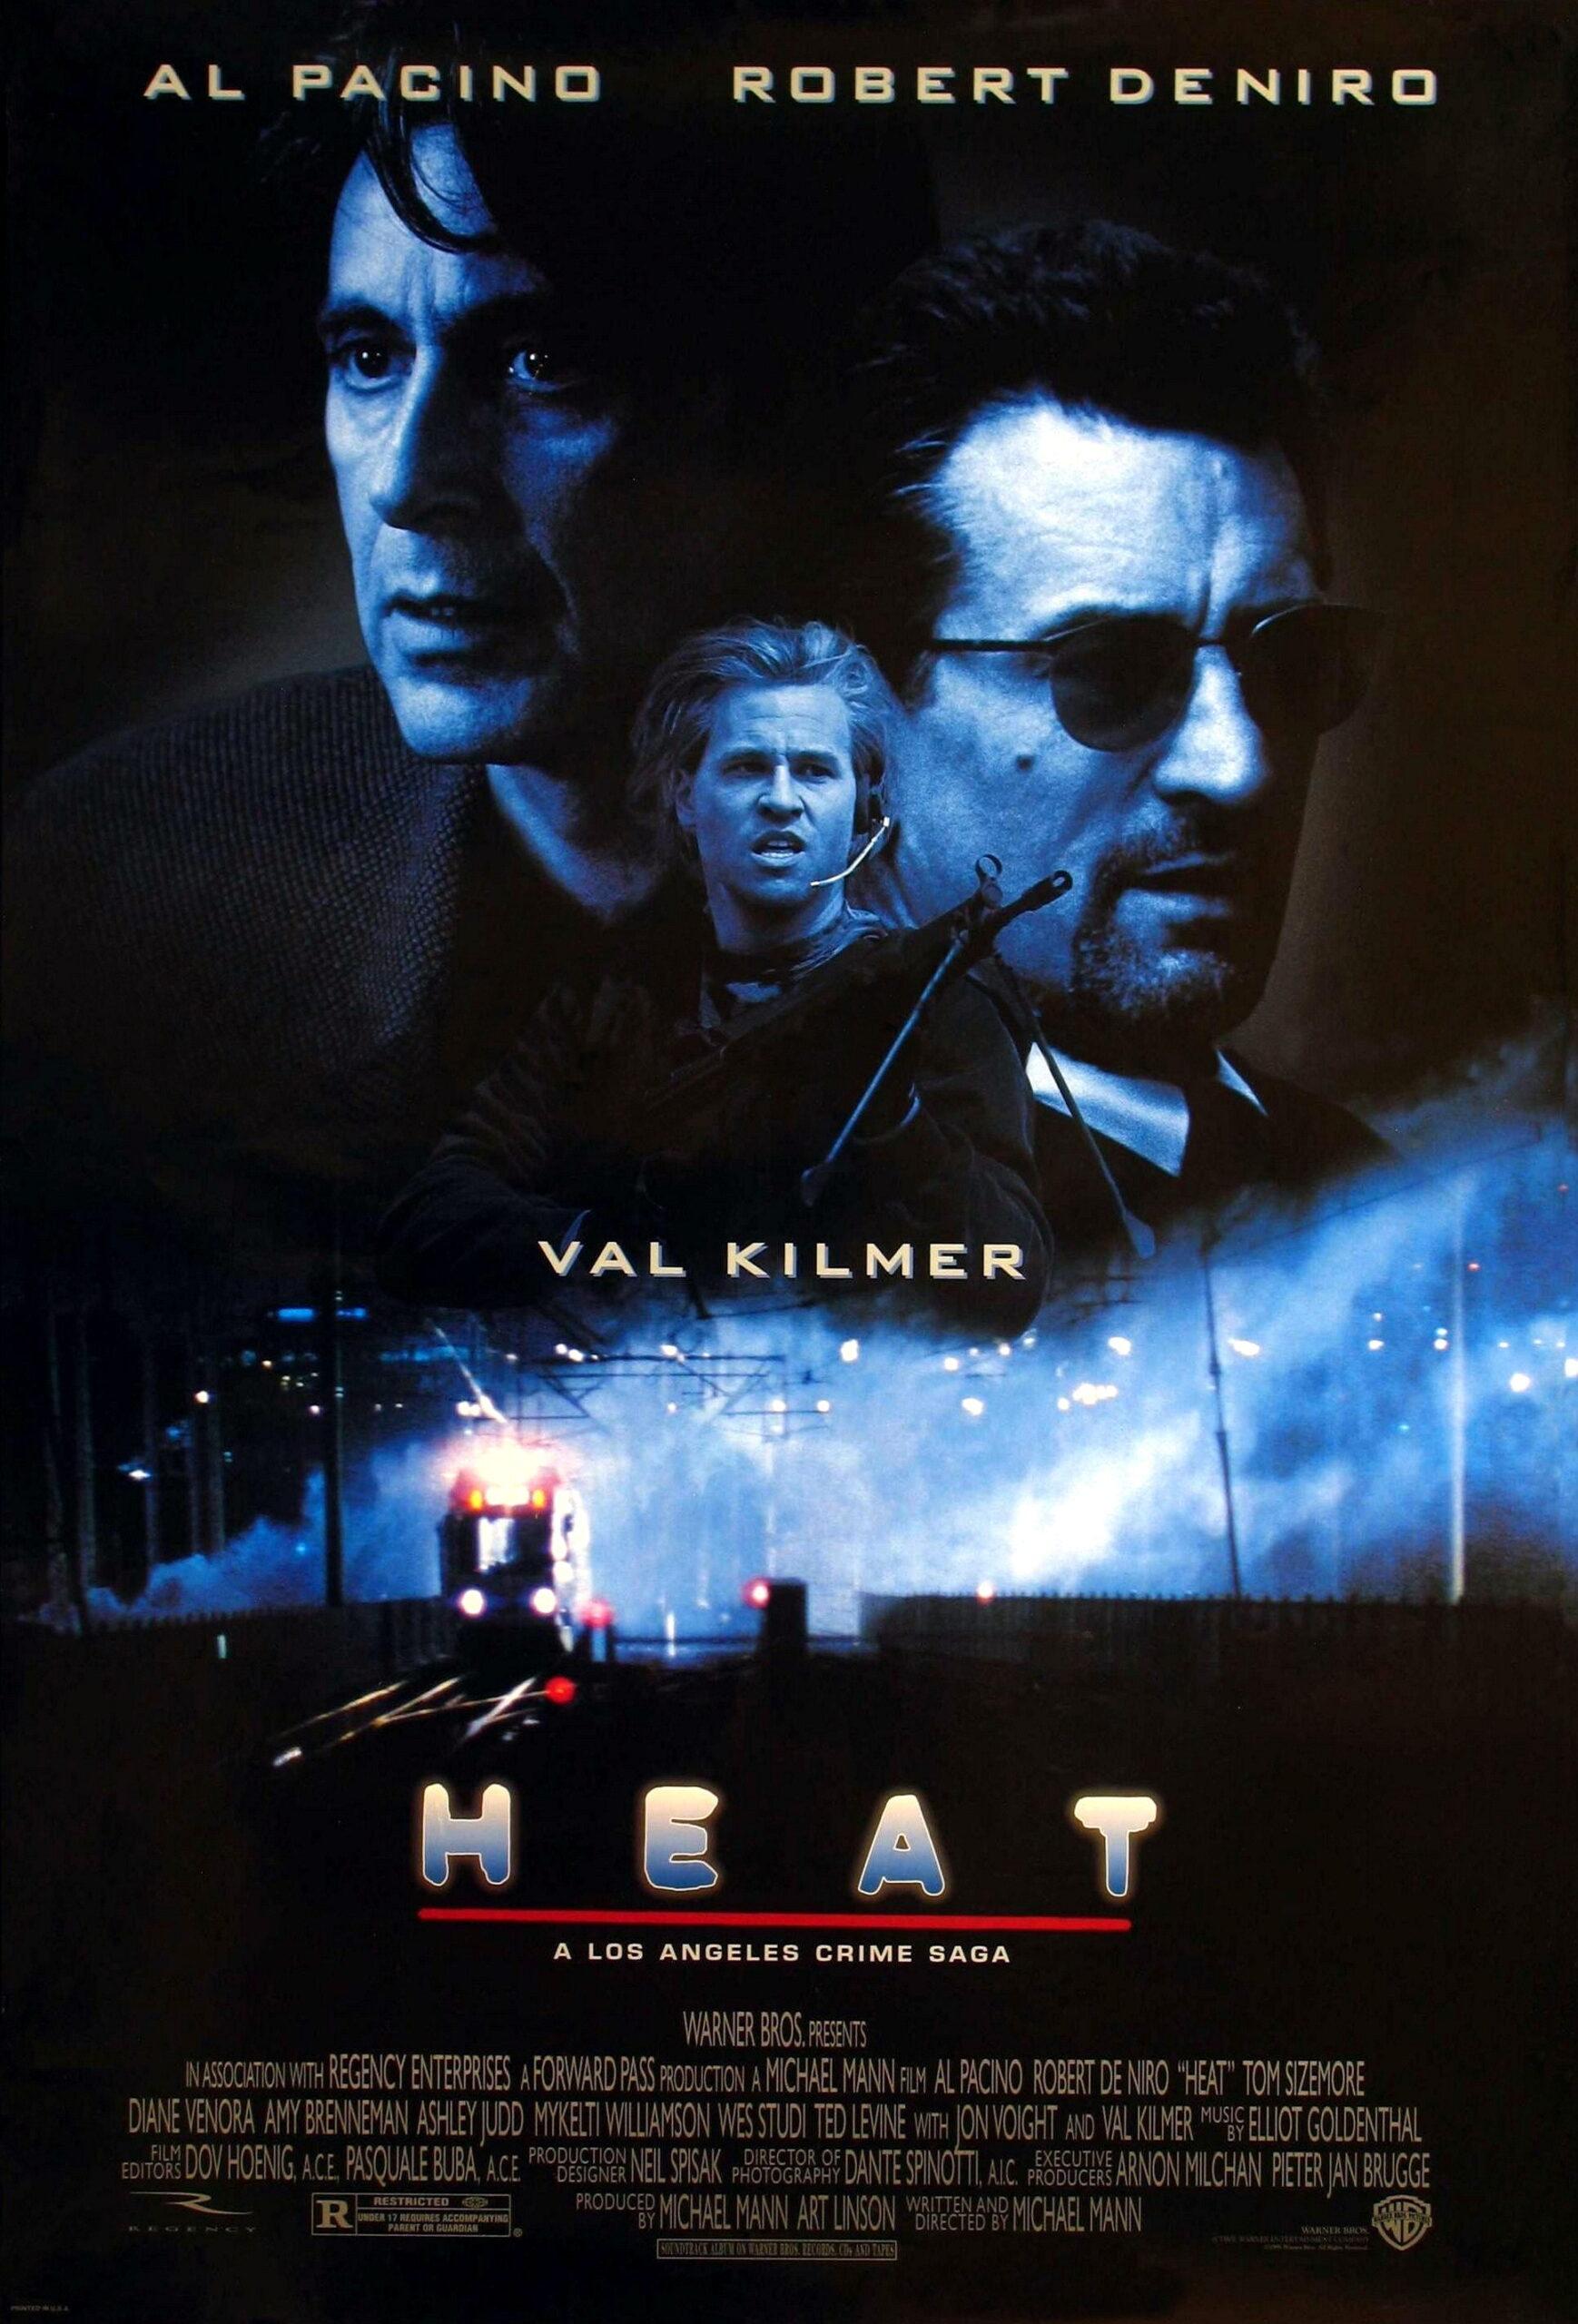 Poster for Michael Mann's 1995 crime movie, 'Heat' featuring Al Pacino, Robert De Niro and Val Kilmer | Offerings: Tom Karangelov Interview | Slam City Skates